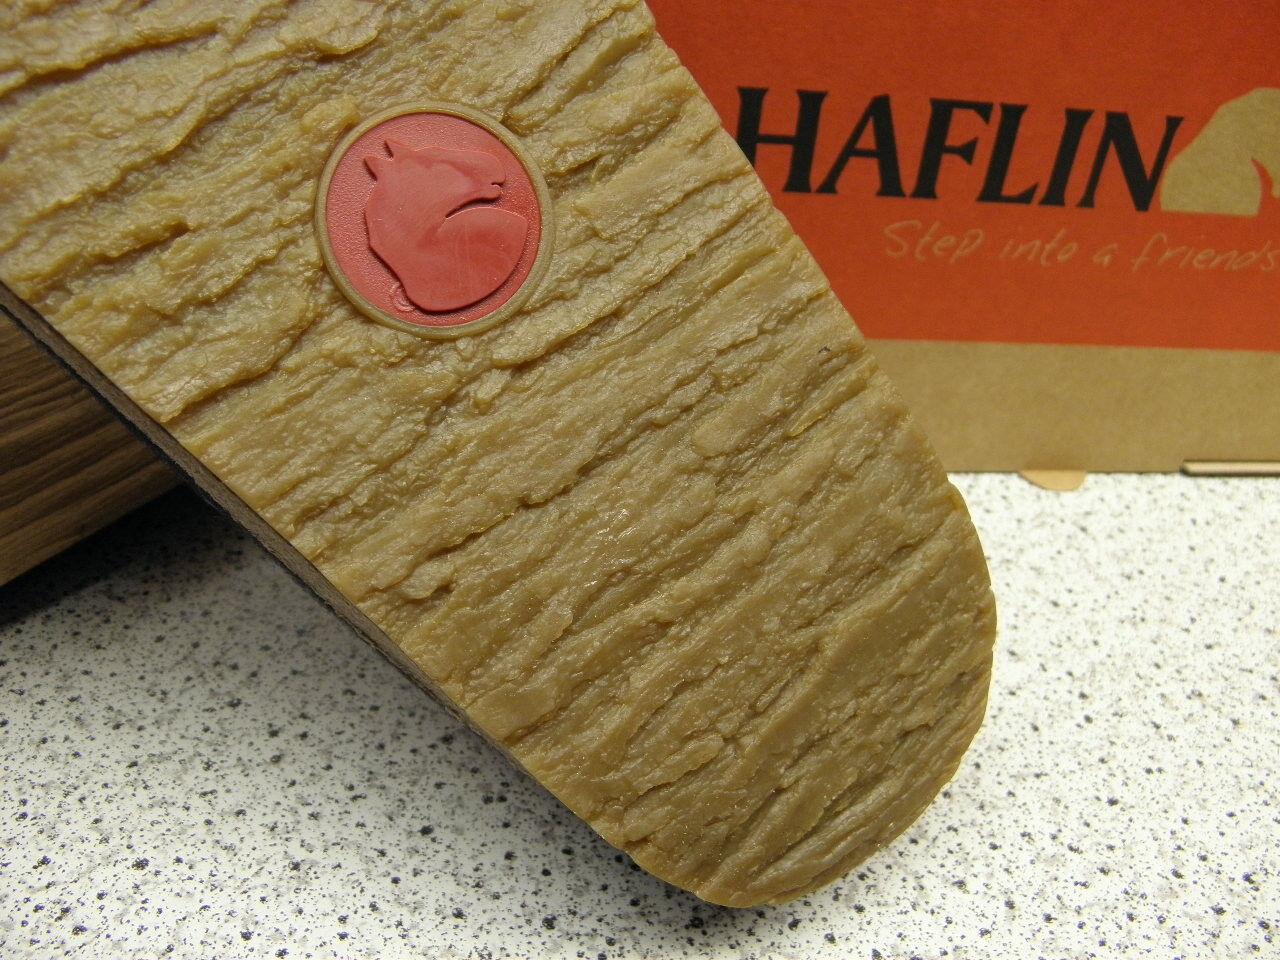 Haflinger® - ROTuziert  bisher 54,95 - Haflinger® 64,95  Grizzly Torben graphit 713001 (H1) 7131c9